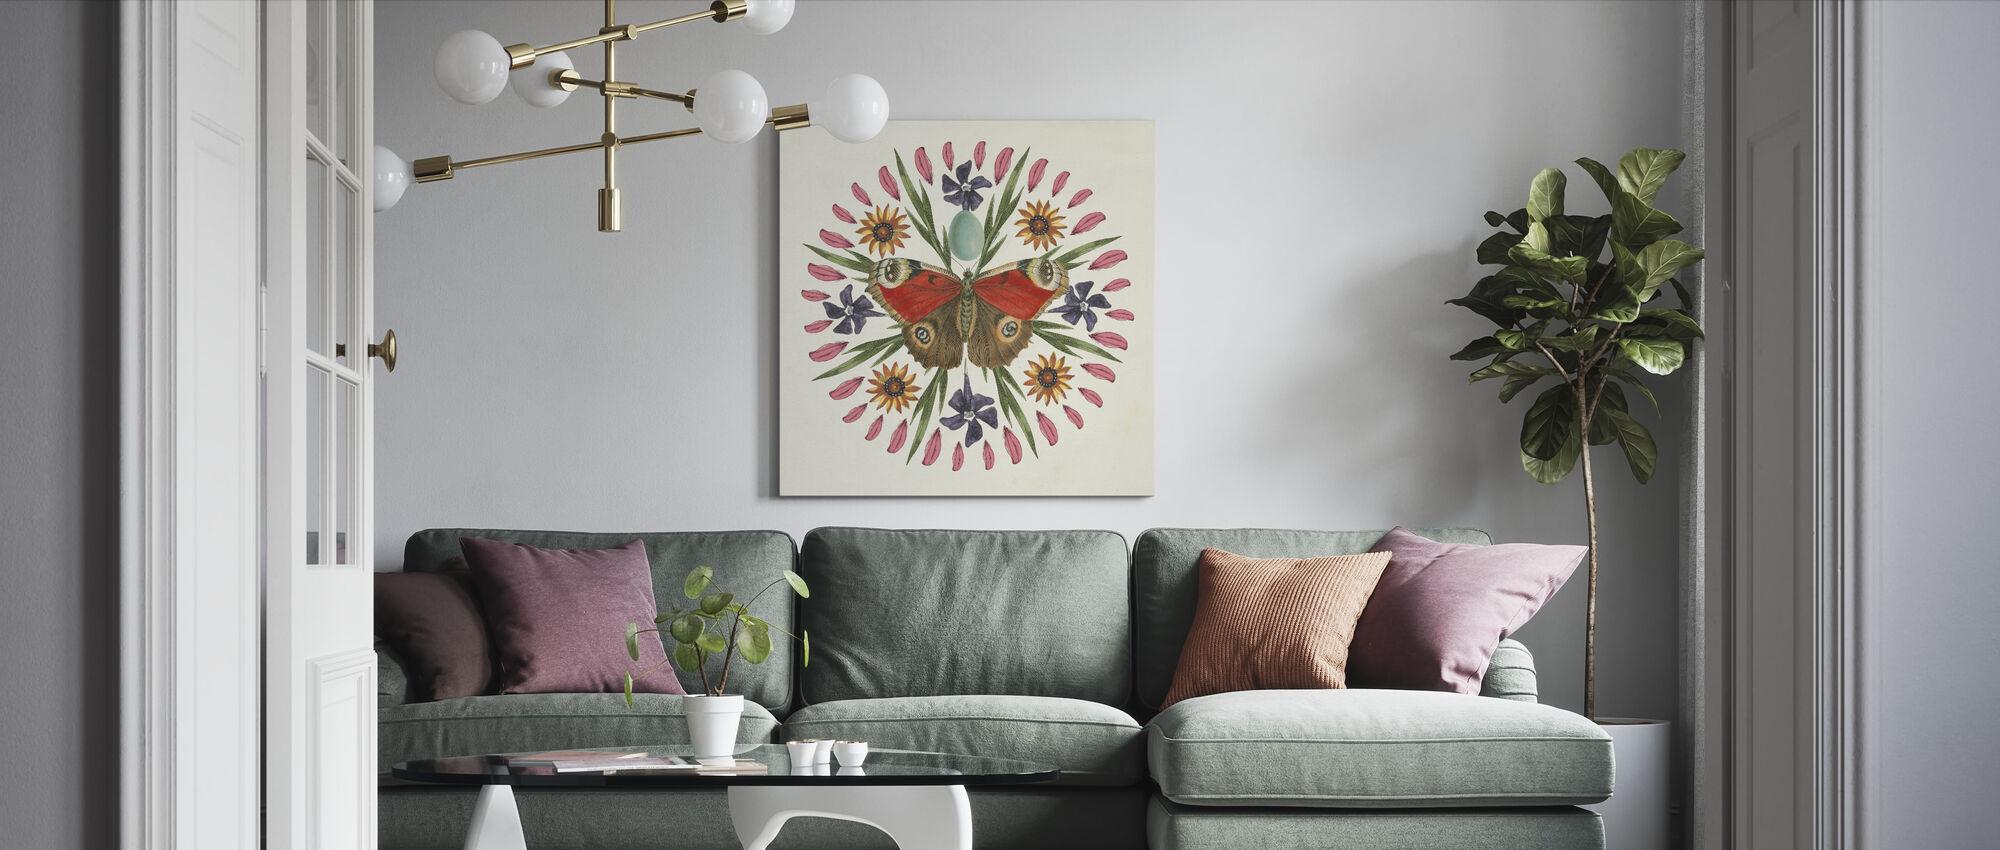 Fjäril Mandala - Canvastavla - Vardagsrum